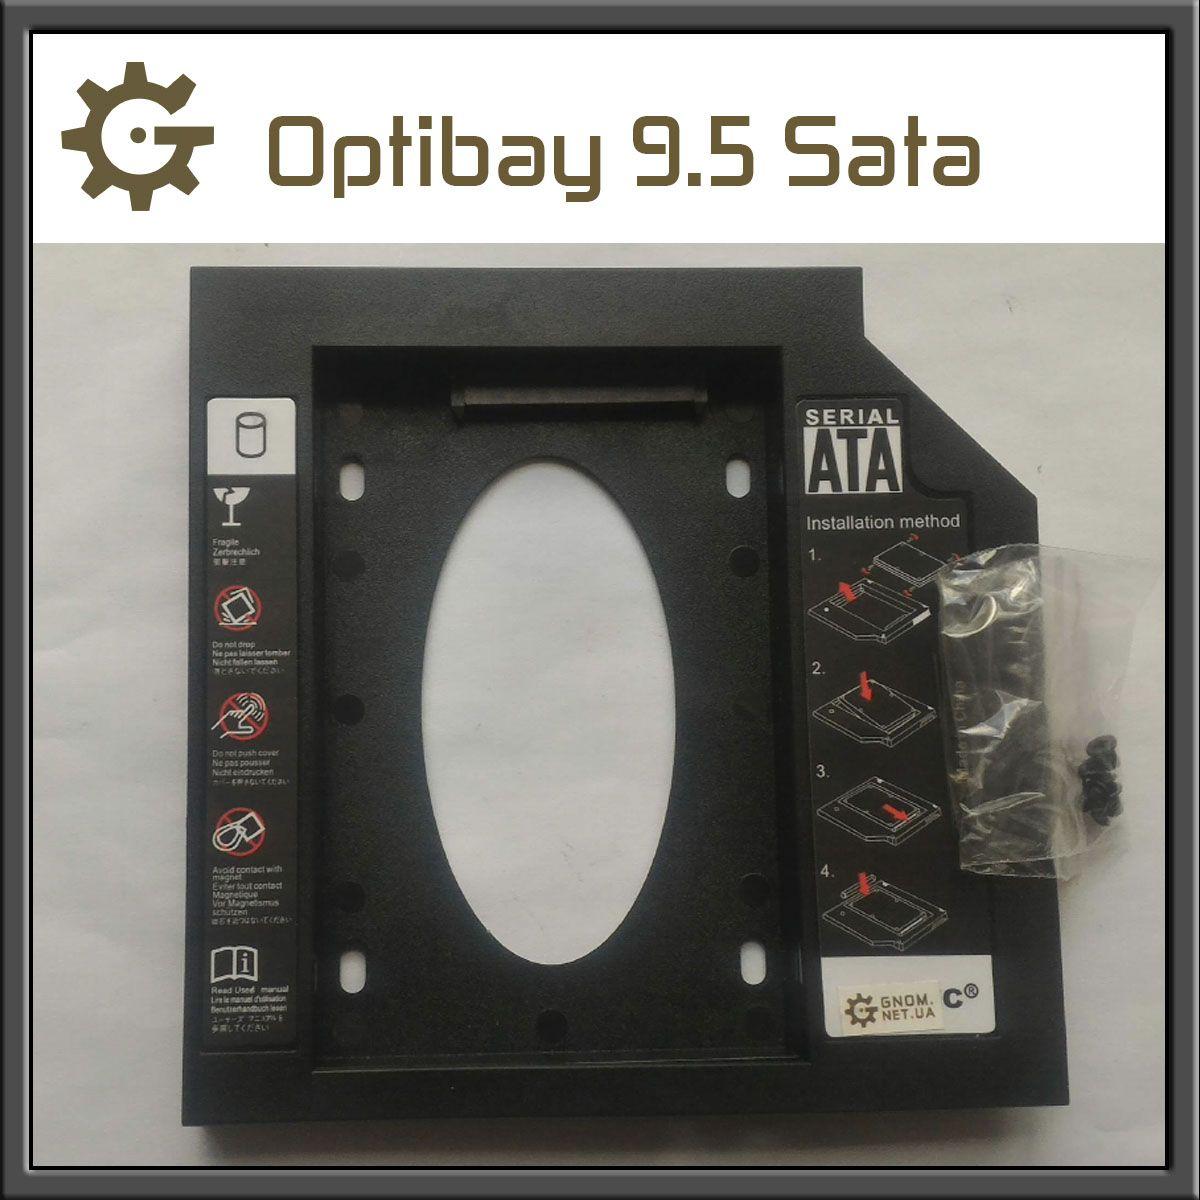 Карман переходник Optibay 9,5 Кадди Оптибей Sata HDD и SSD вместо DVD